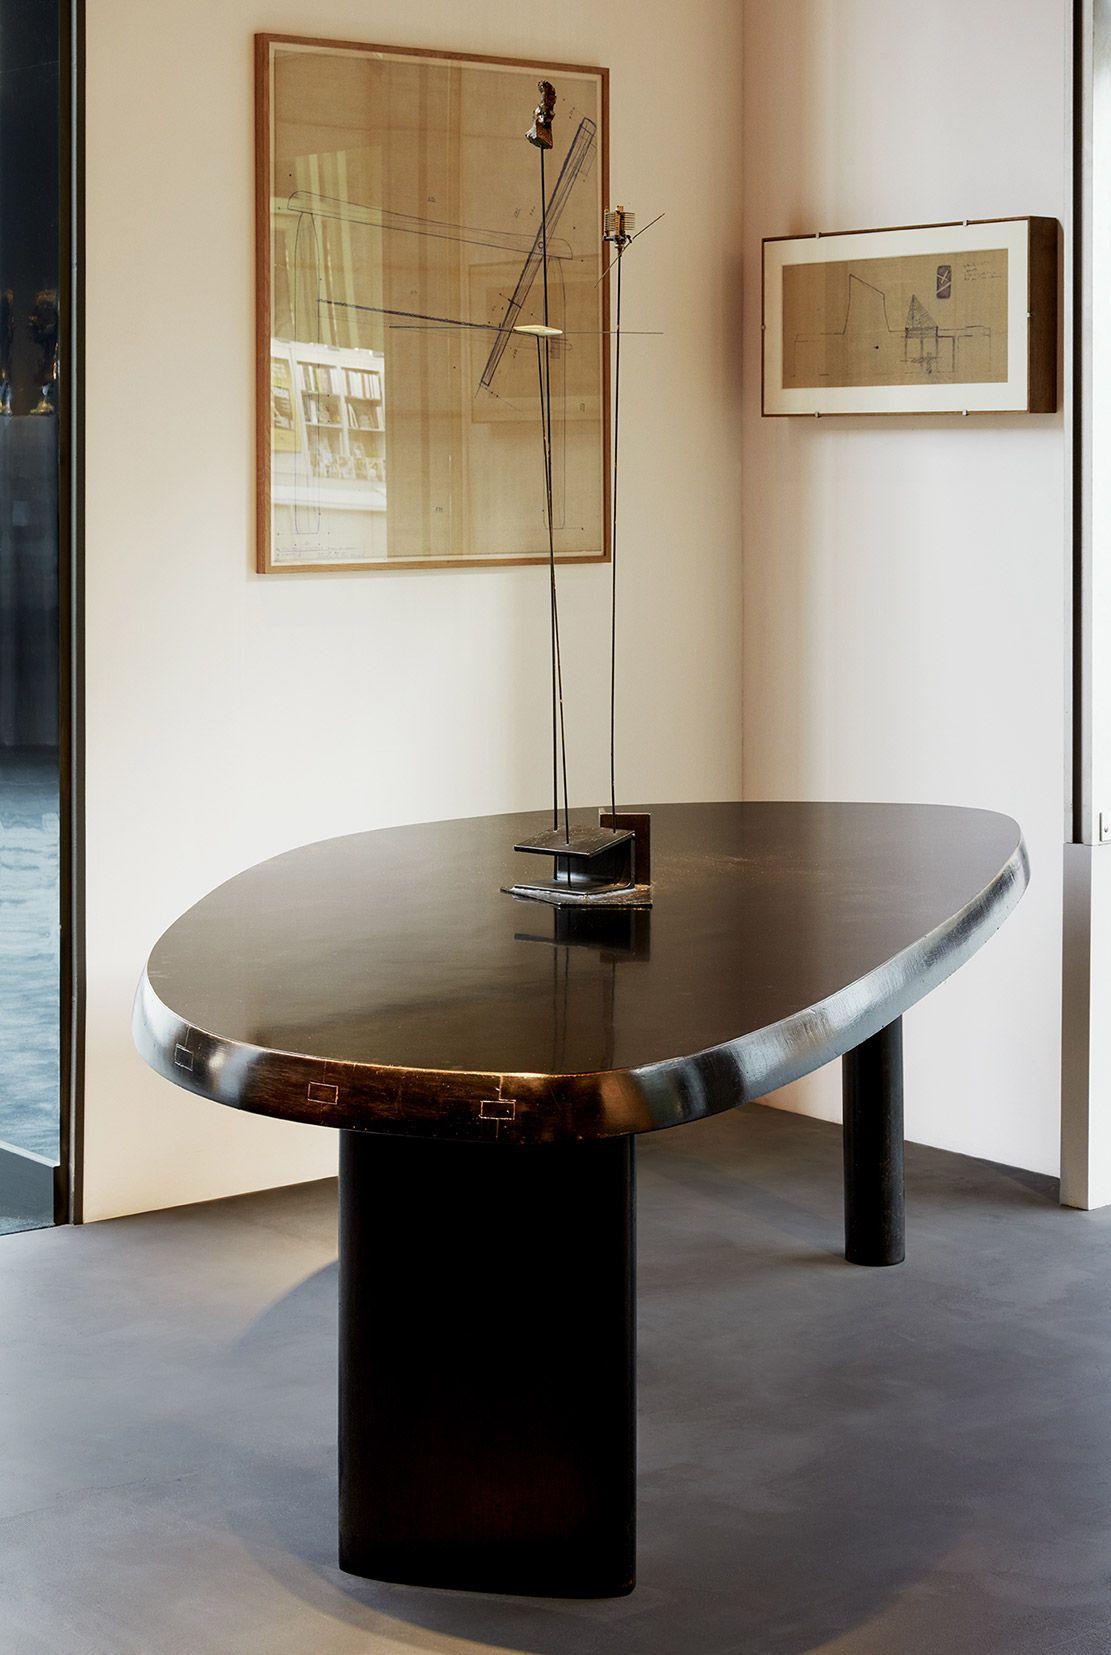 Galerie Downtown Mobilier Design Meuble Salle A Manger Meuble Maison